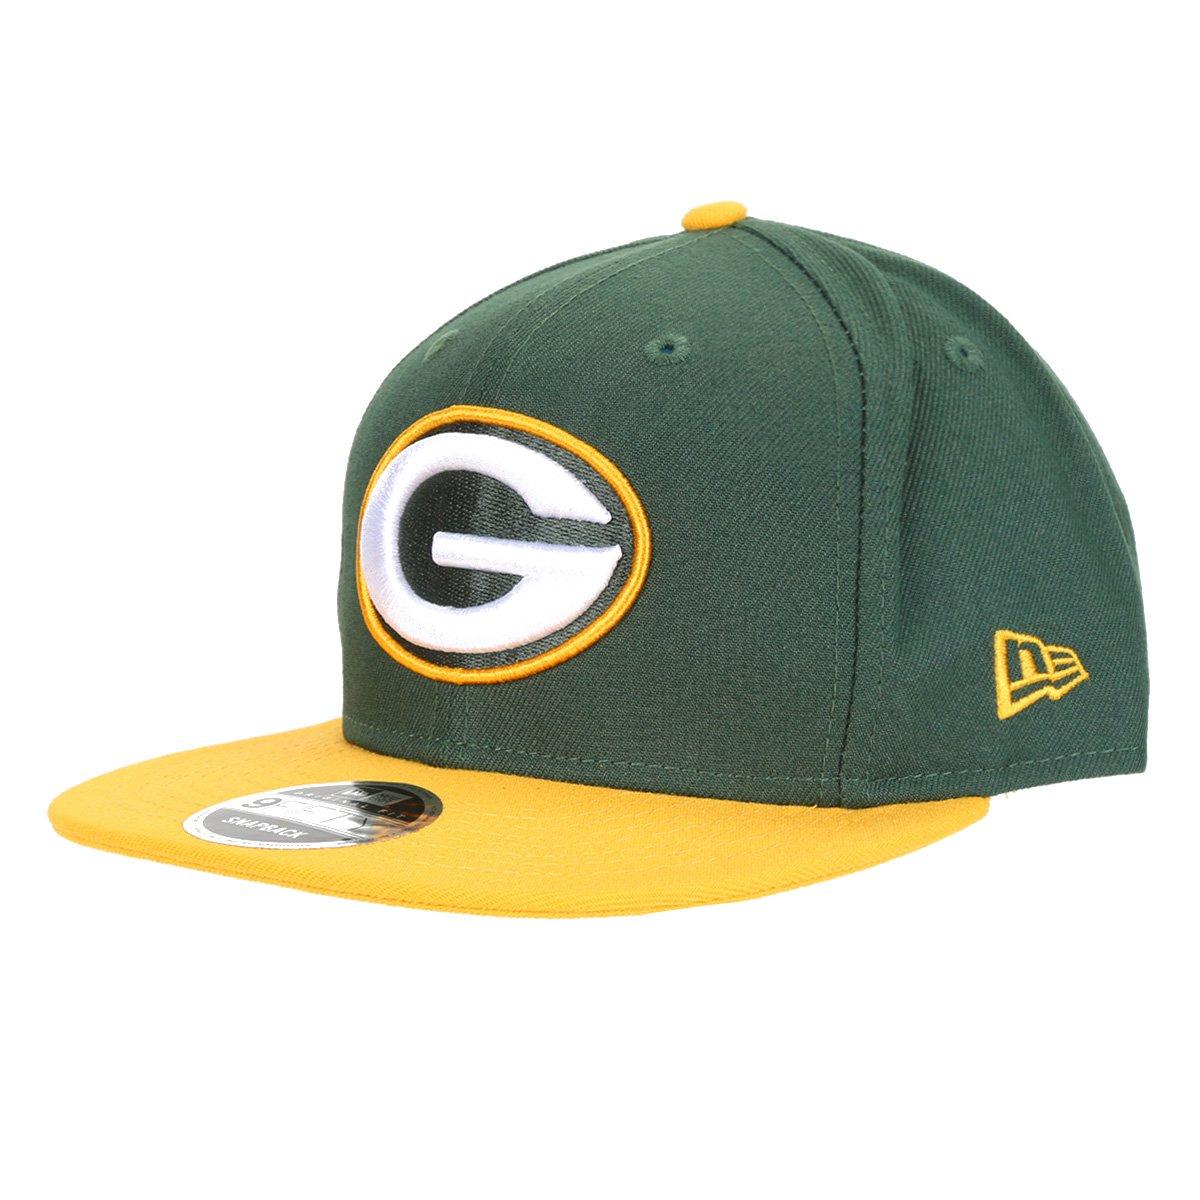 Boné New Era NFL Green Bay Packers Aba Reta Snapback 950 Of Sn Team Color